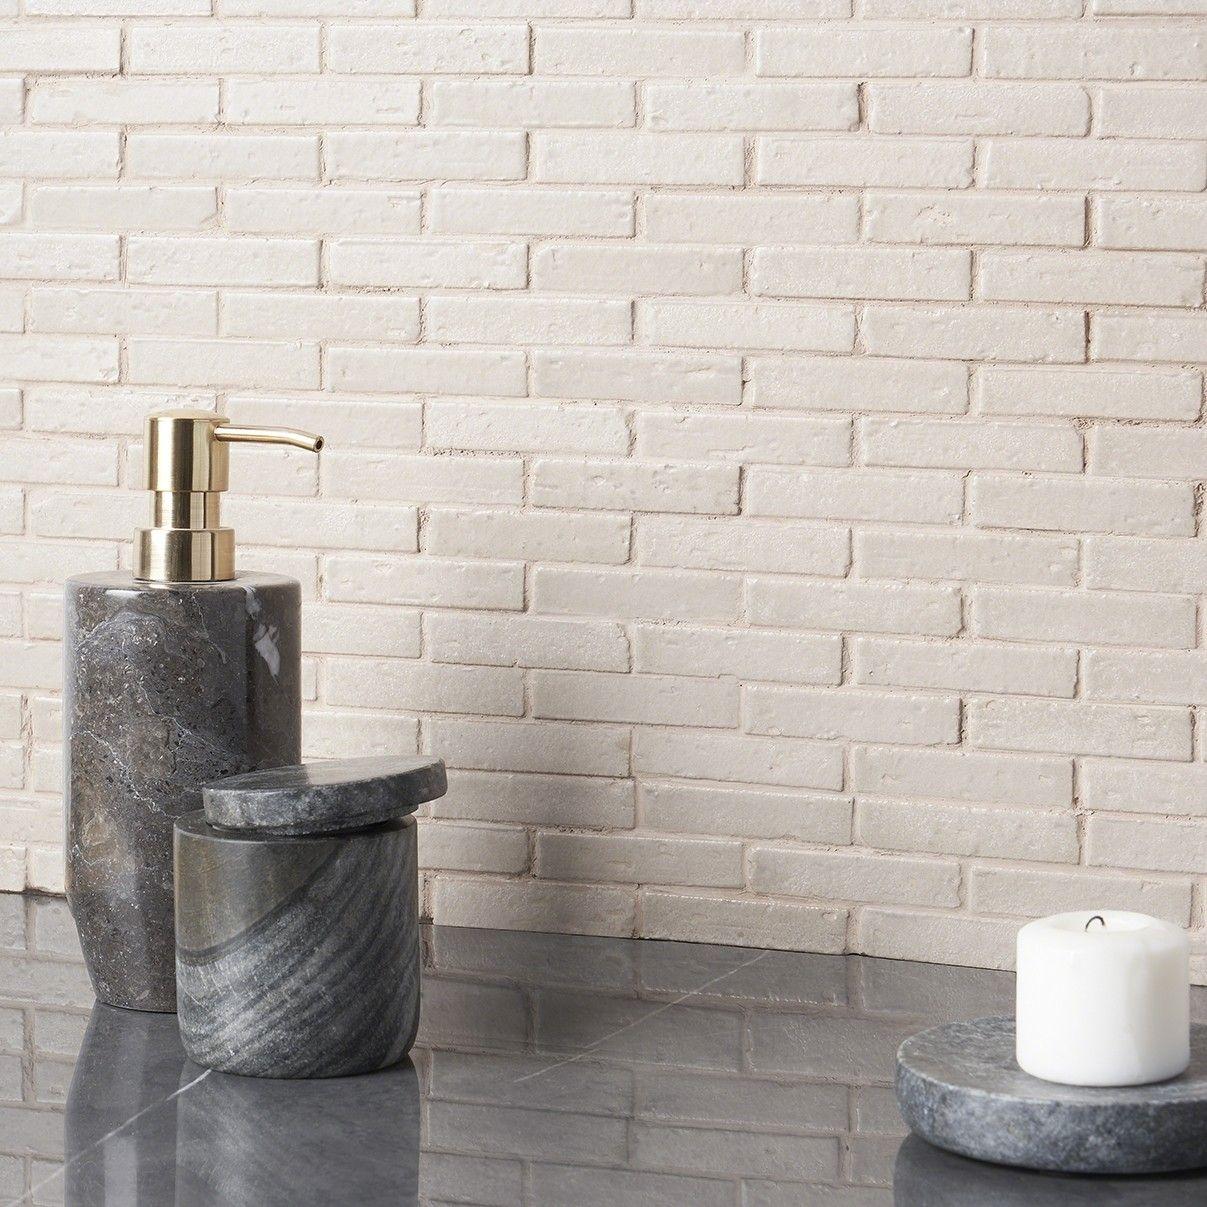 Bohemian Brick Tundra 1 2x3 Mosaic Tile With Images Mosaic